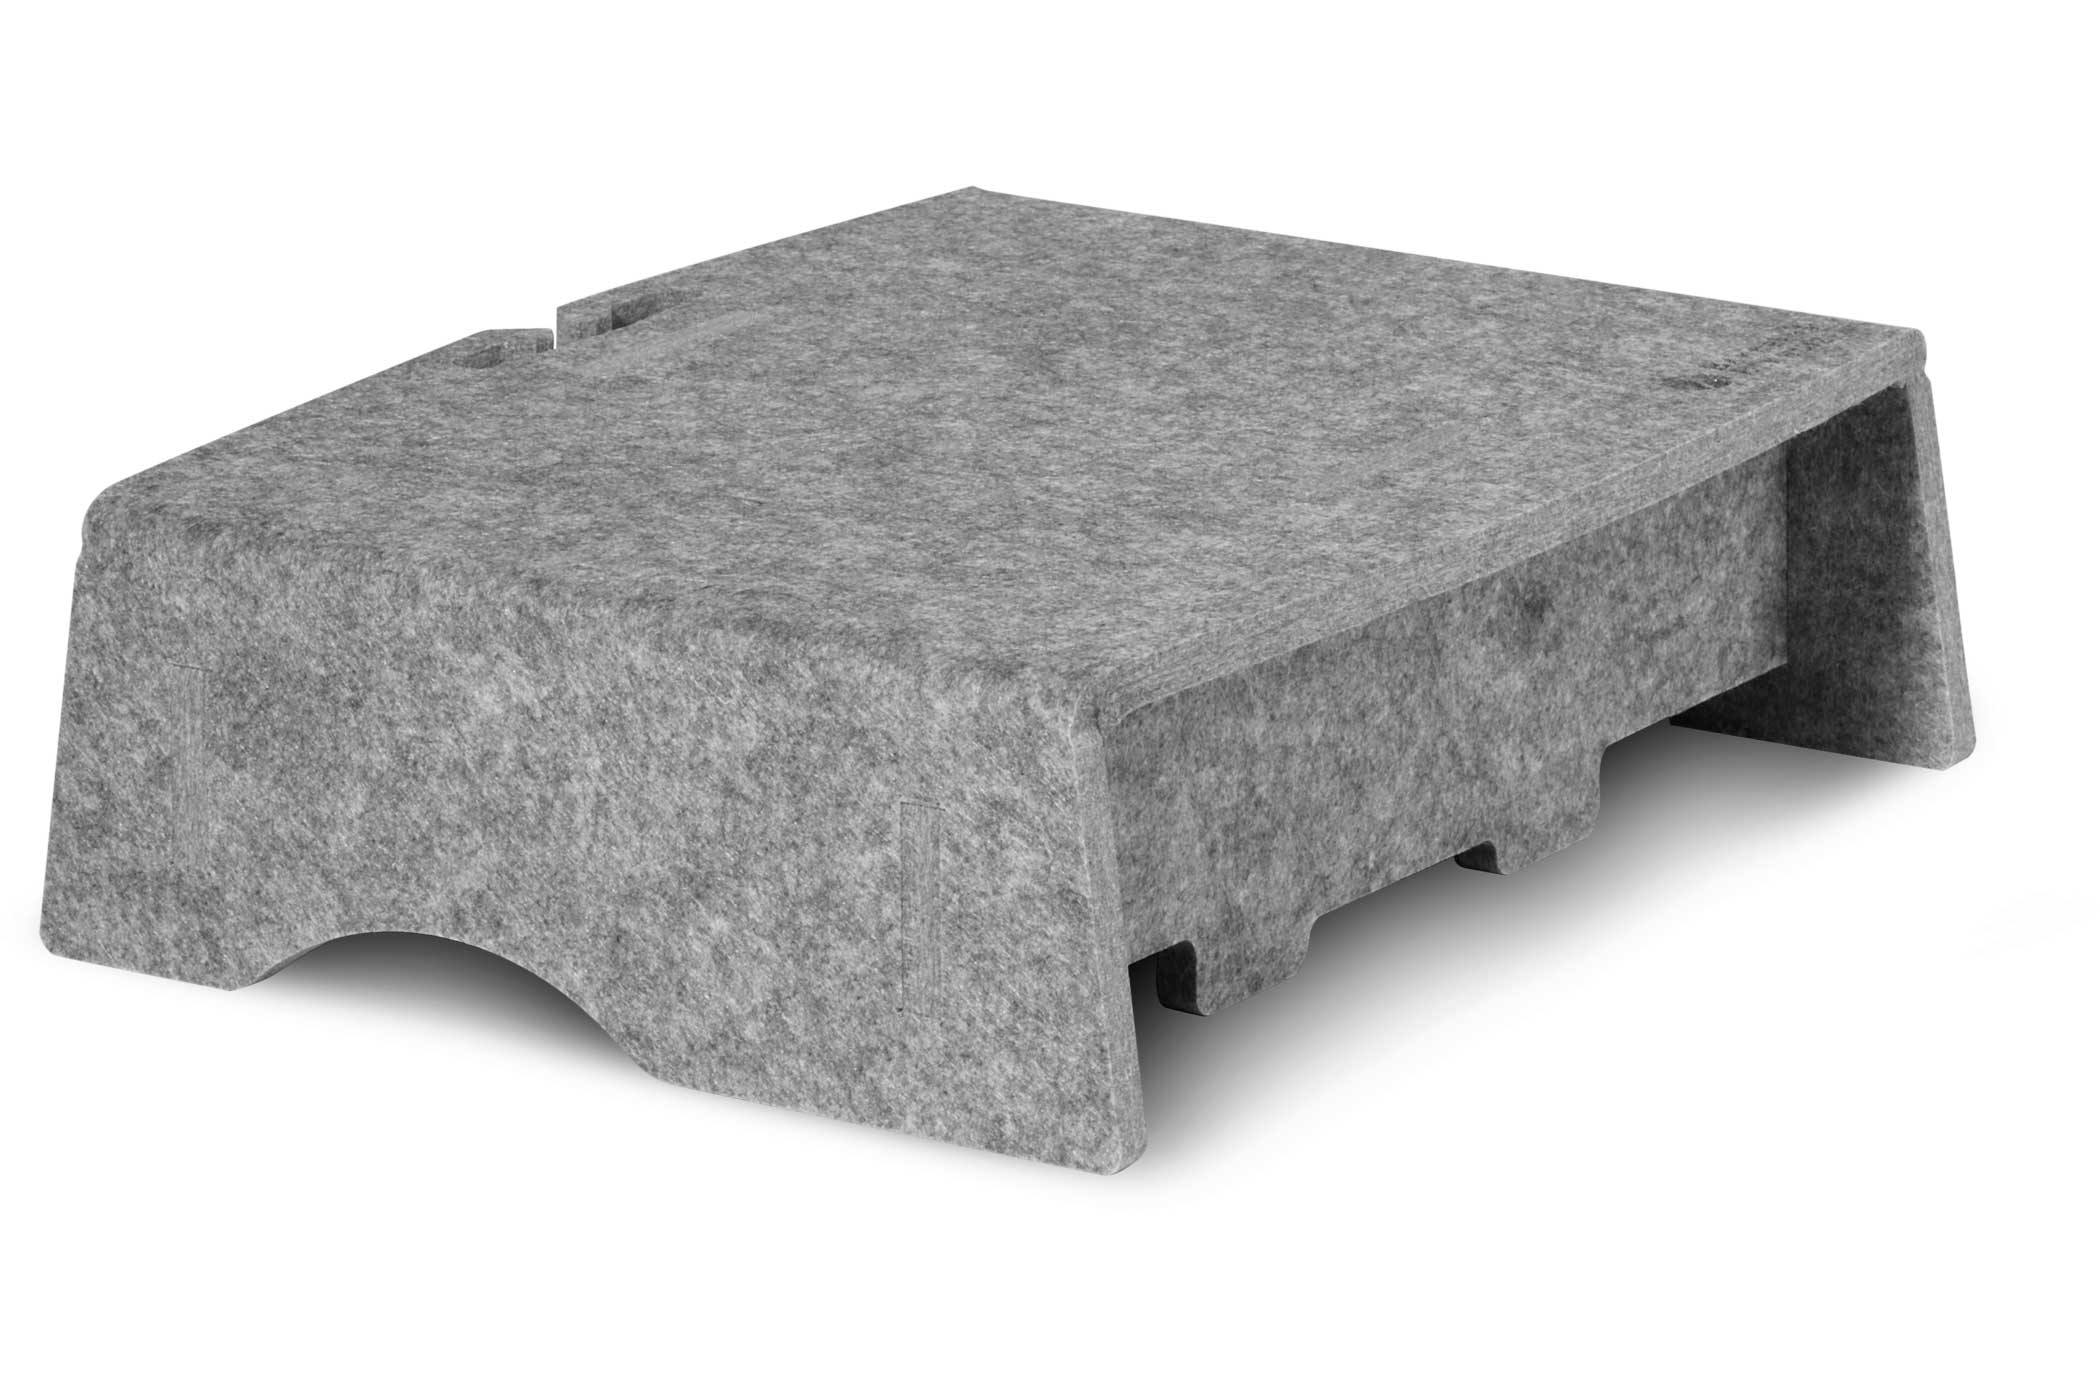 Vorschau: Bakker Q-Riser 90 Circular - Freistehend - 43,2 cm (17 Zoll) - Grau